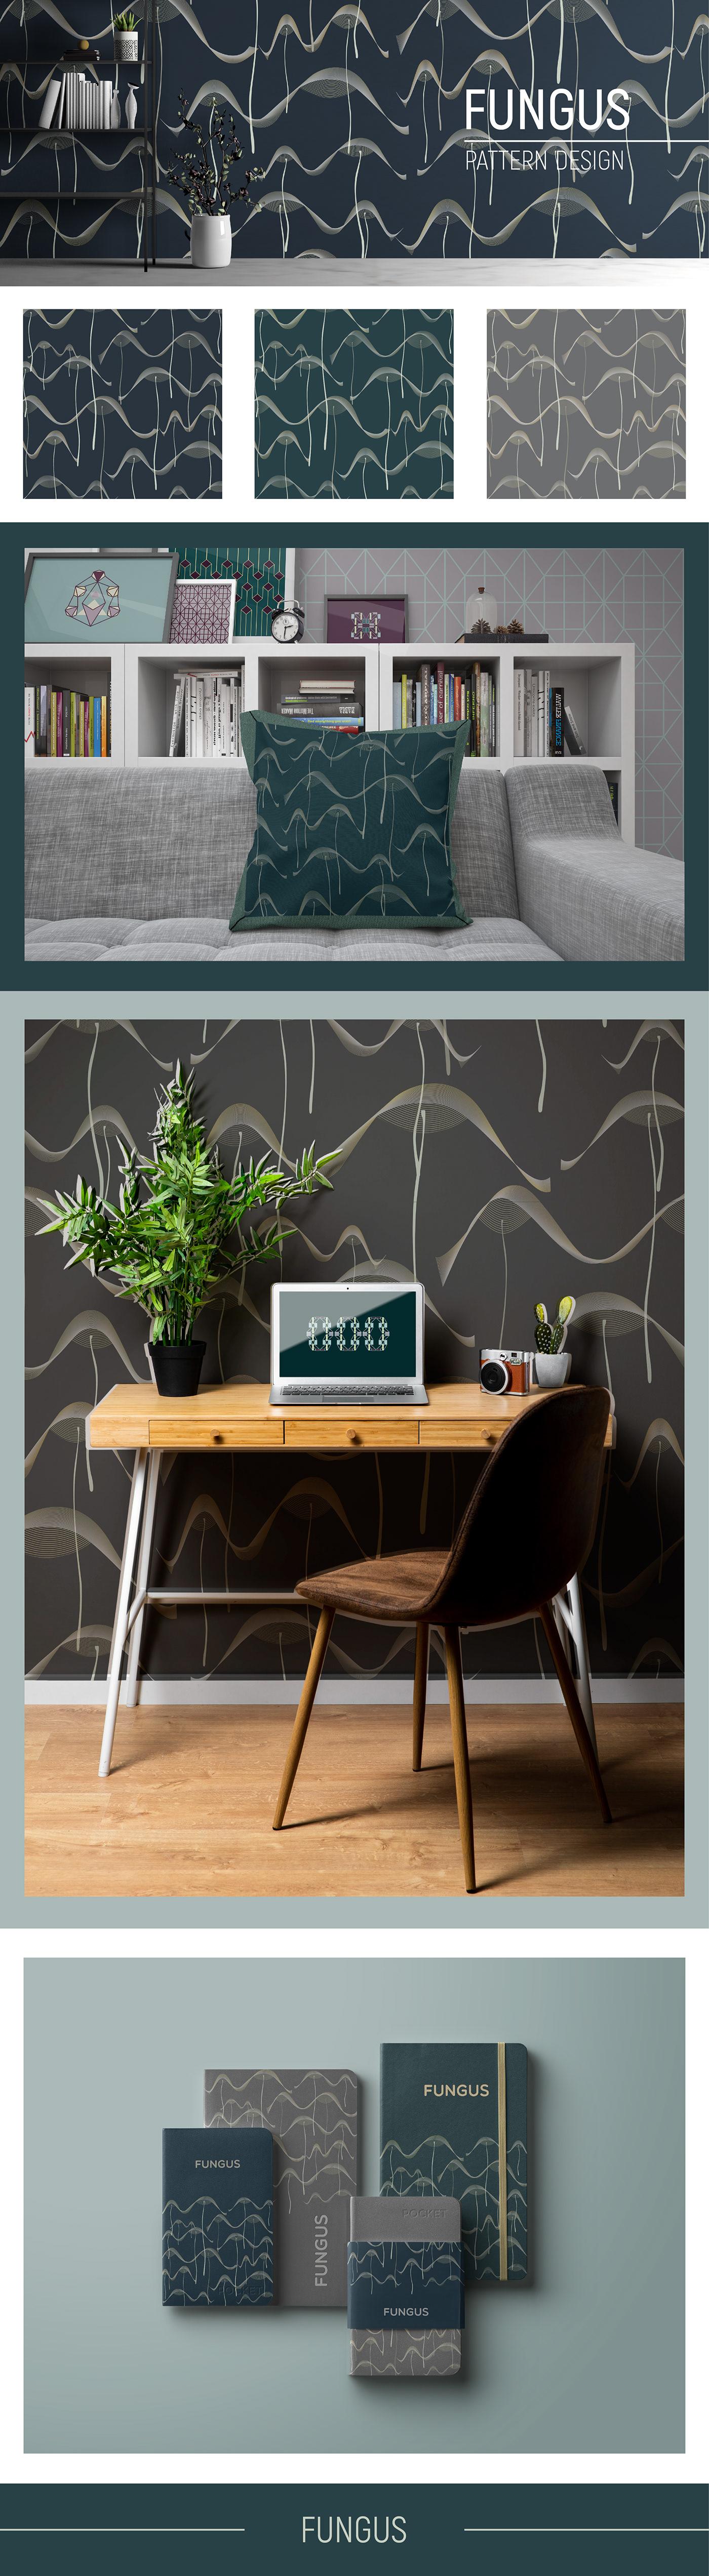 diseñodesuperficies diseñotextil papelpintado pattern design  surfacedesign textiledesign wallpaperdesign